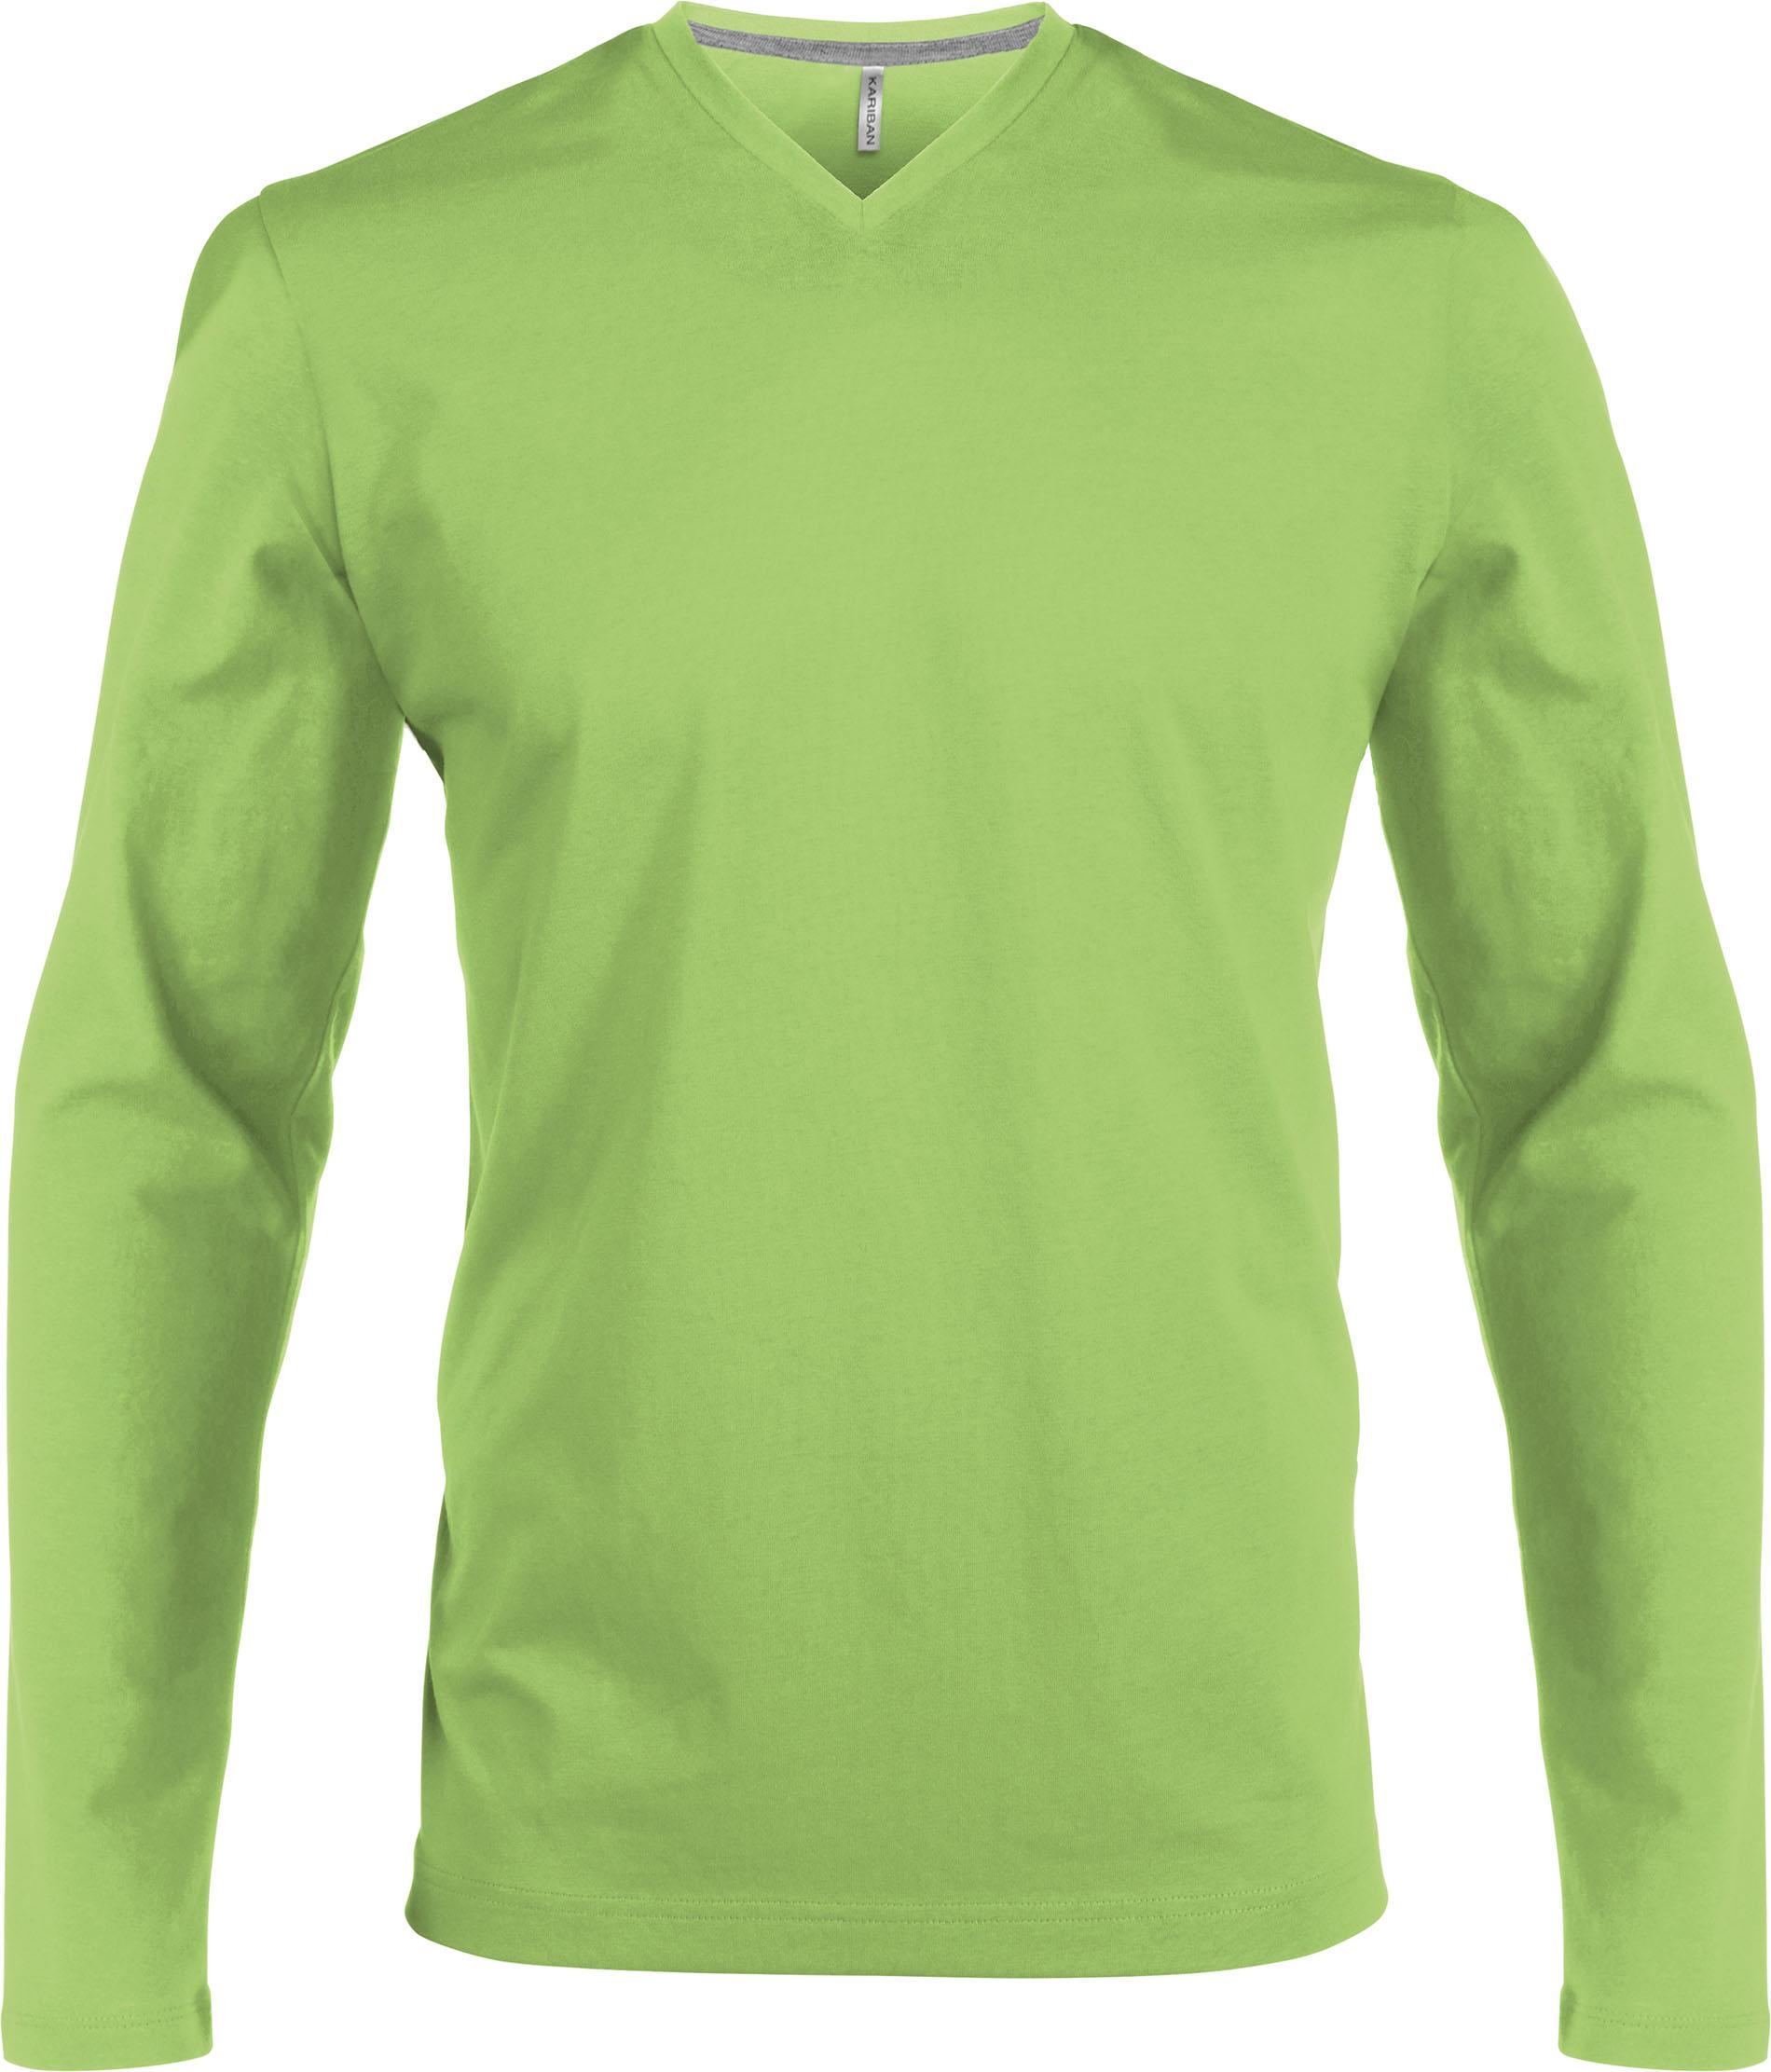 T-paita K358 V-aukko PH Lime